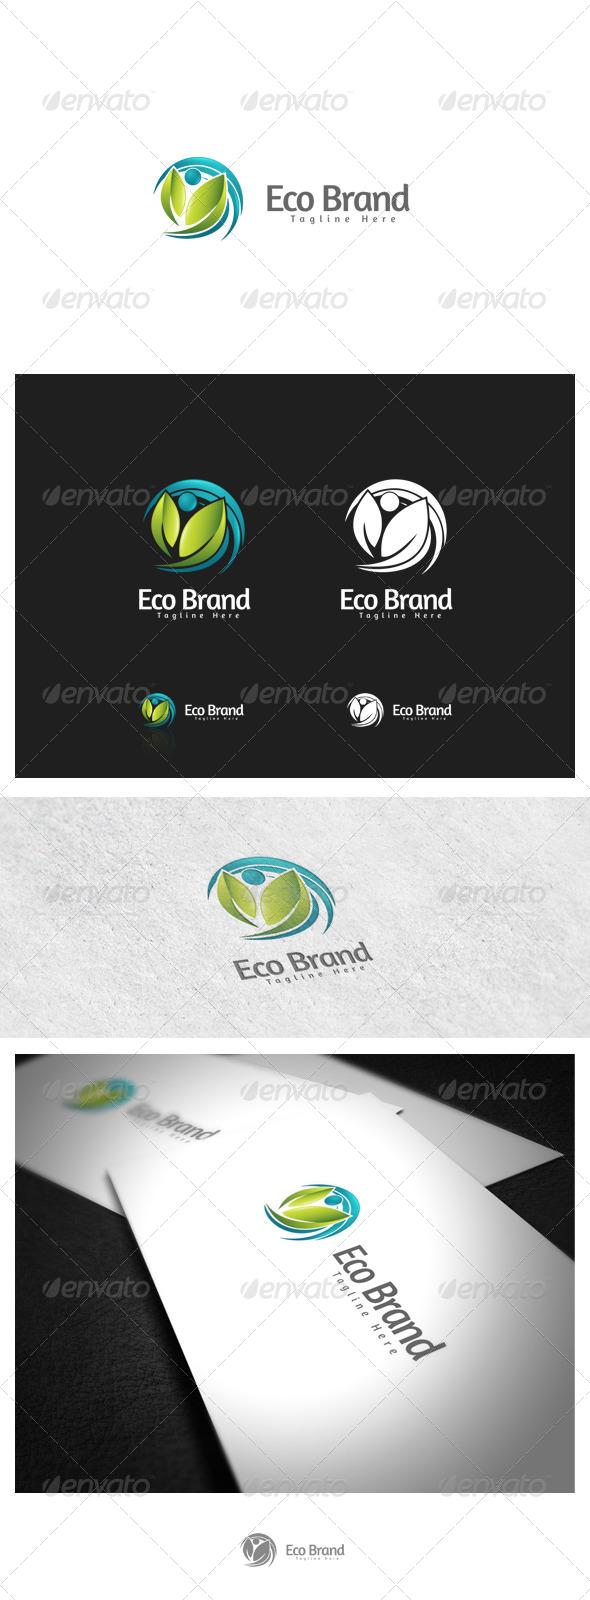 GraphicRiver Eco Brand 4455312